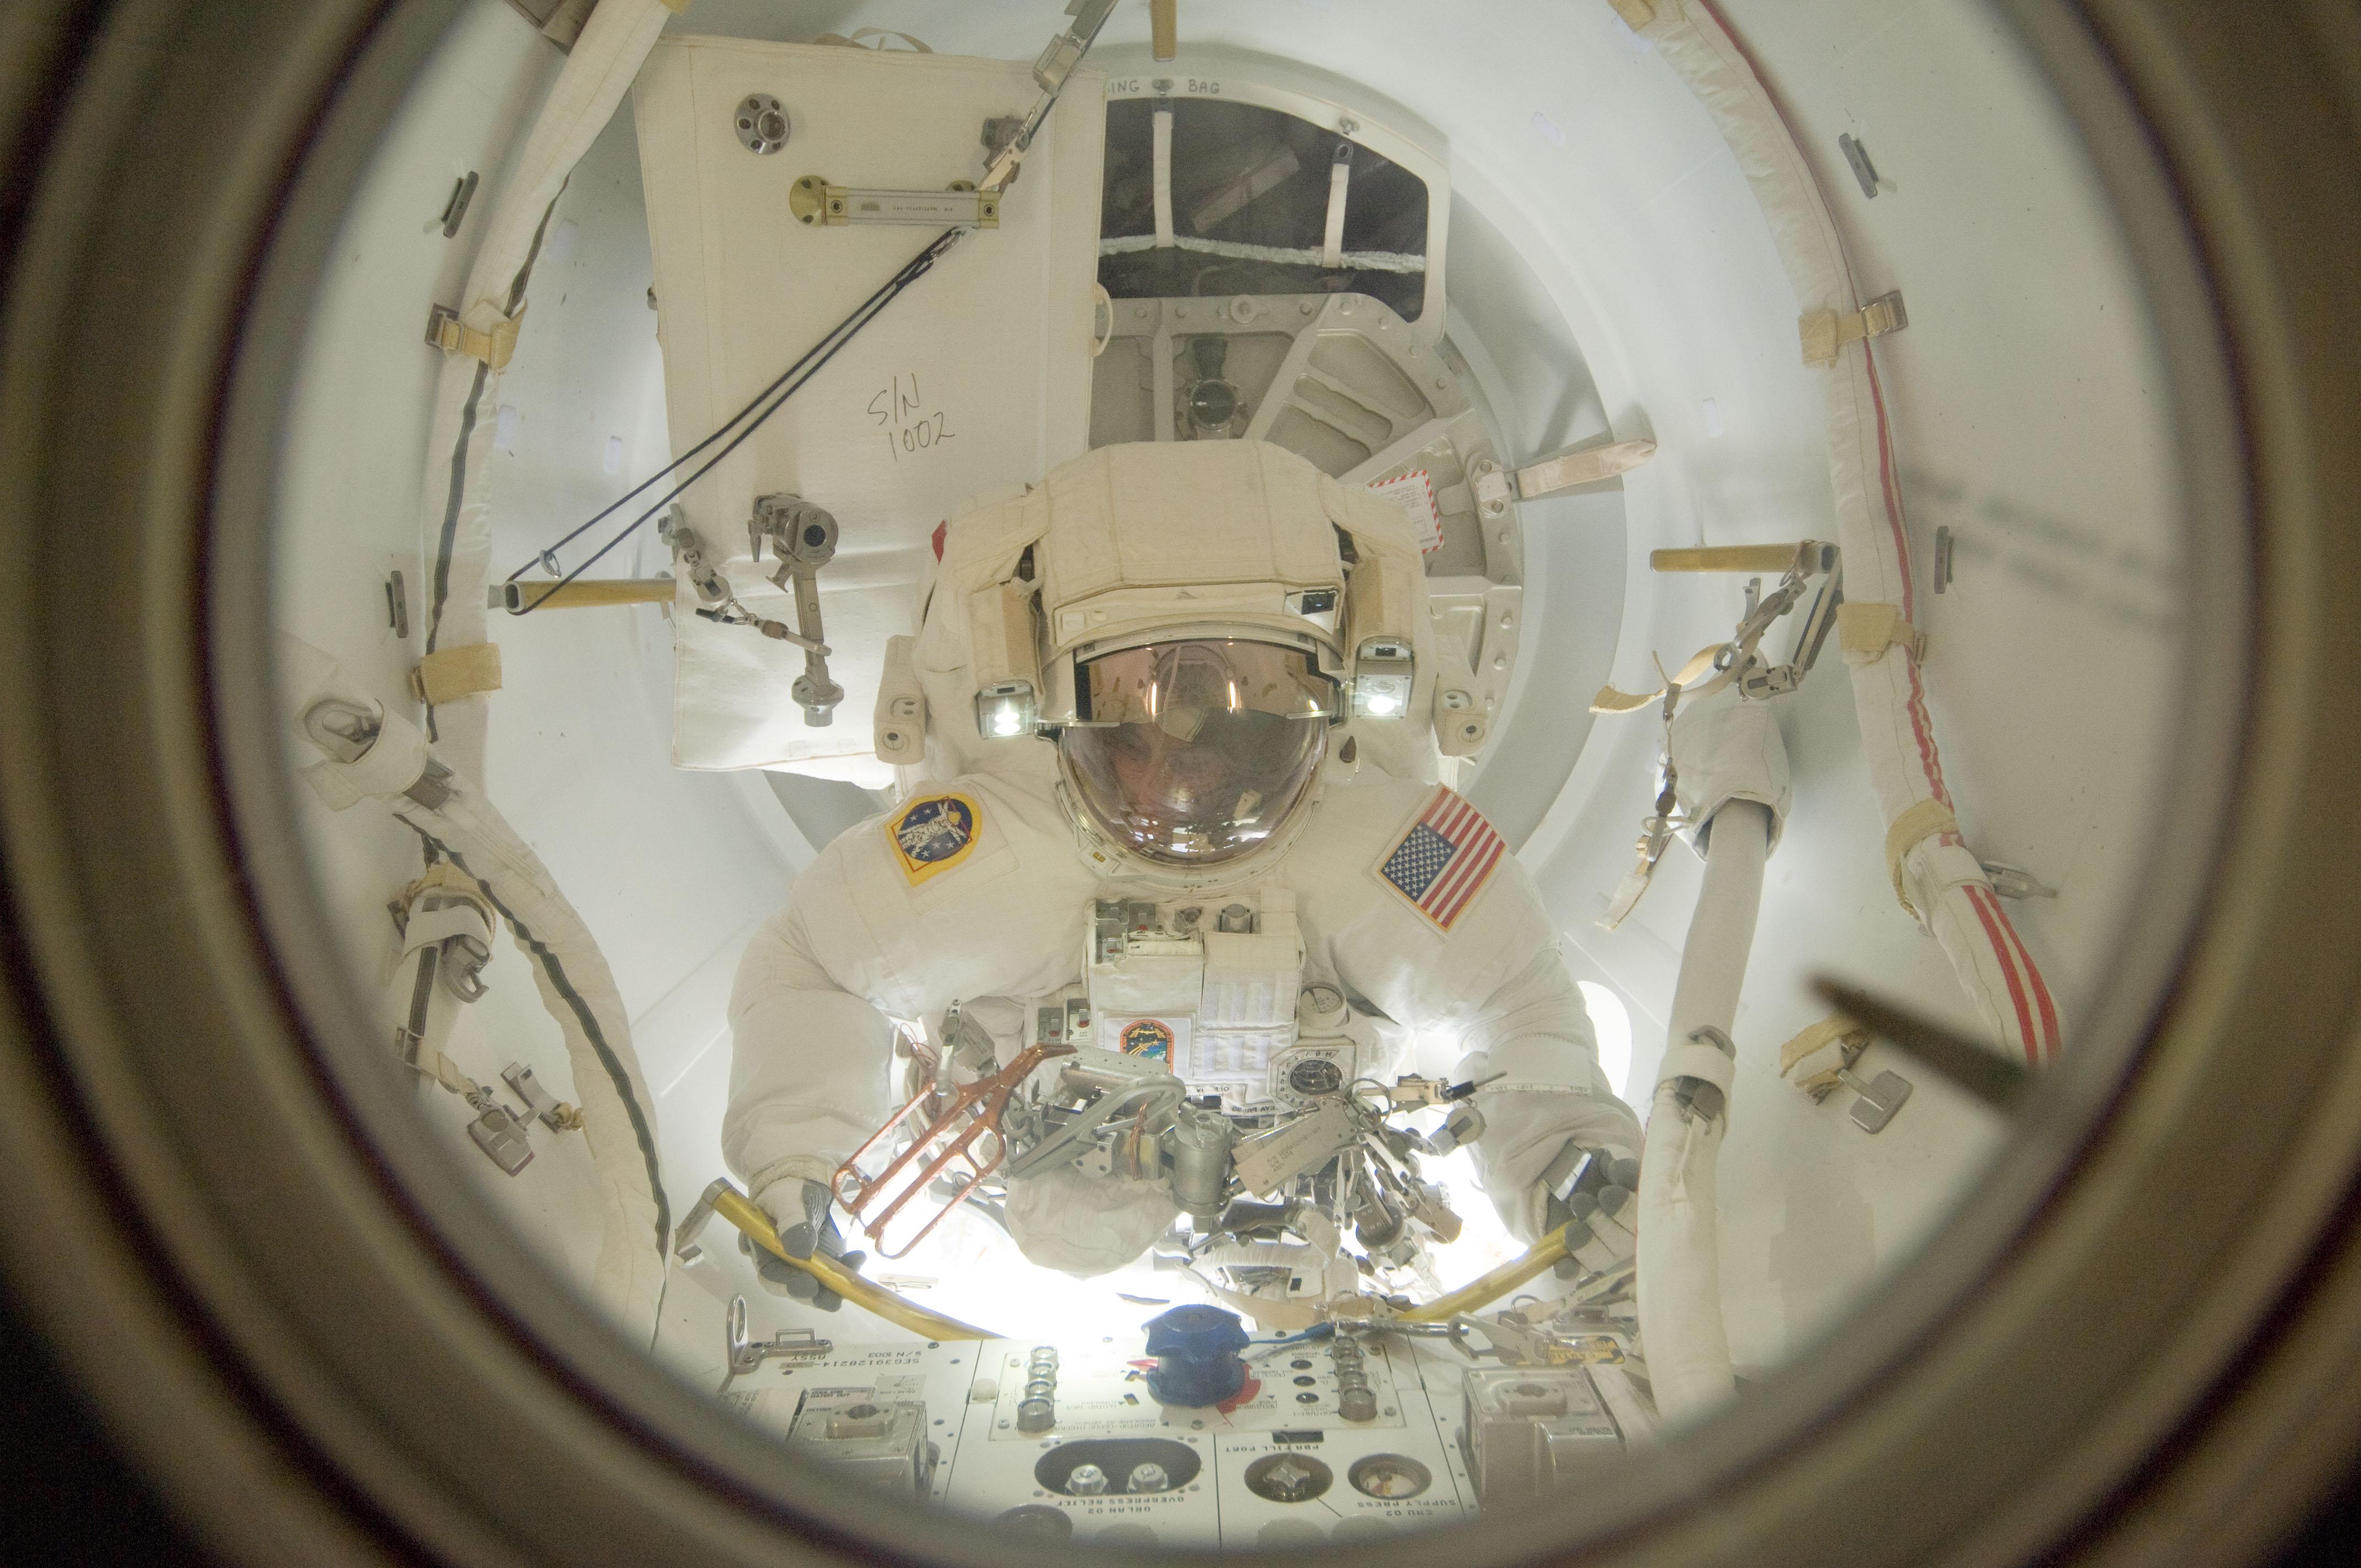 NASA - NASA Astronaut Sunita Williams